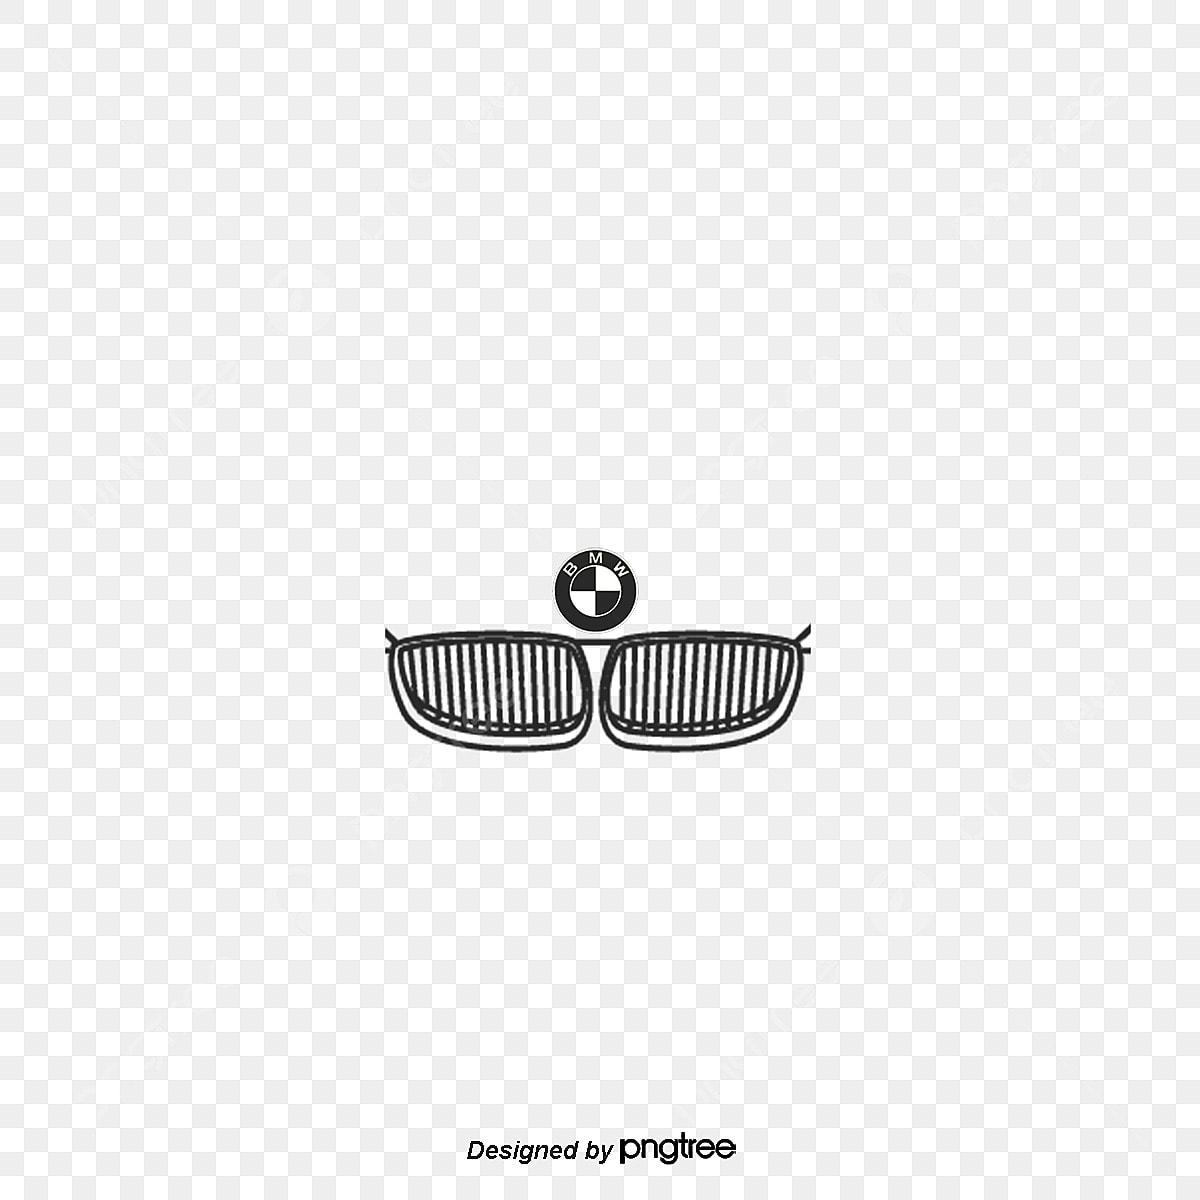 Jeep Logo Vector Suv Marcas Lideres Deluxe Imagem Png E Psd Para Download Gratuito